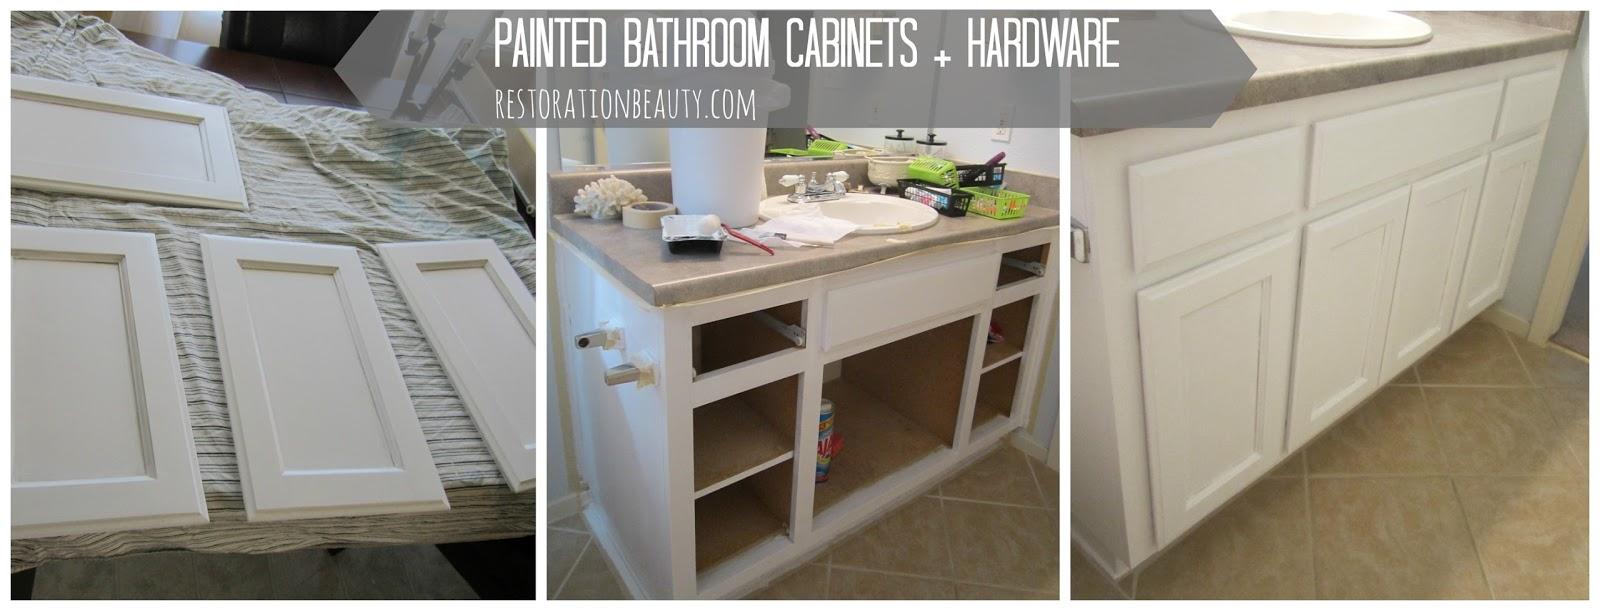 Restoration Beauty: Painted Bathroom Cabinets + Hardware